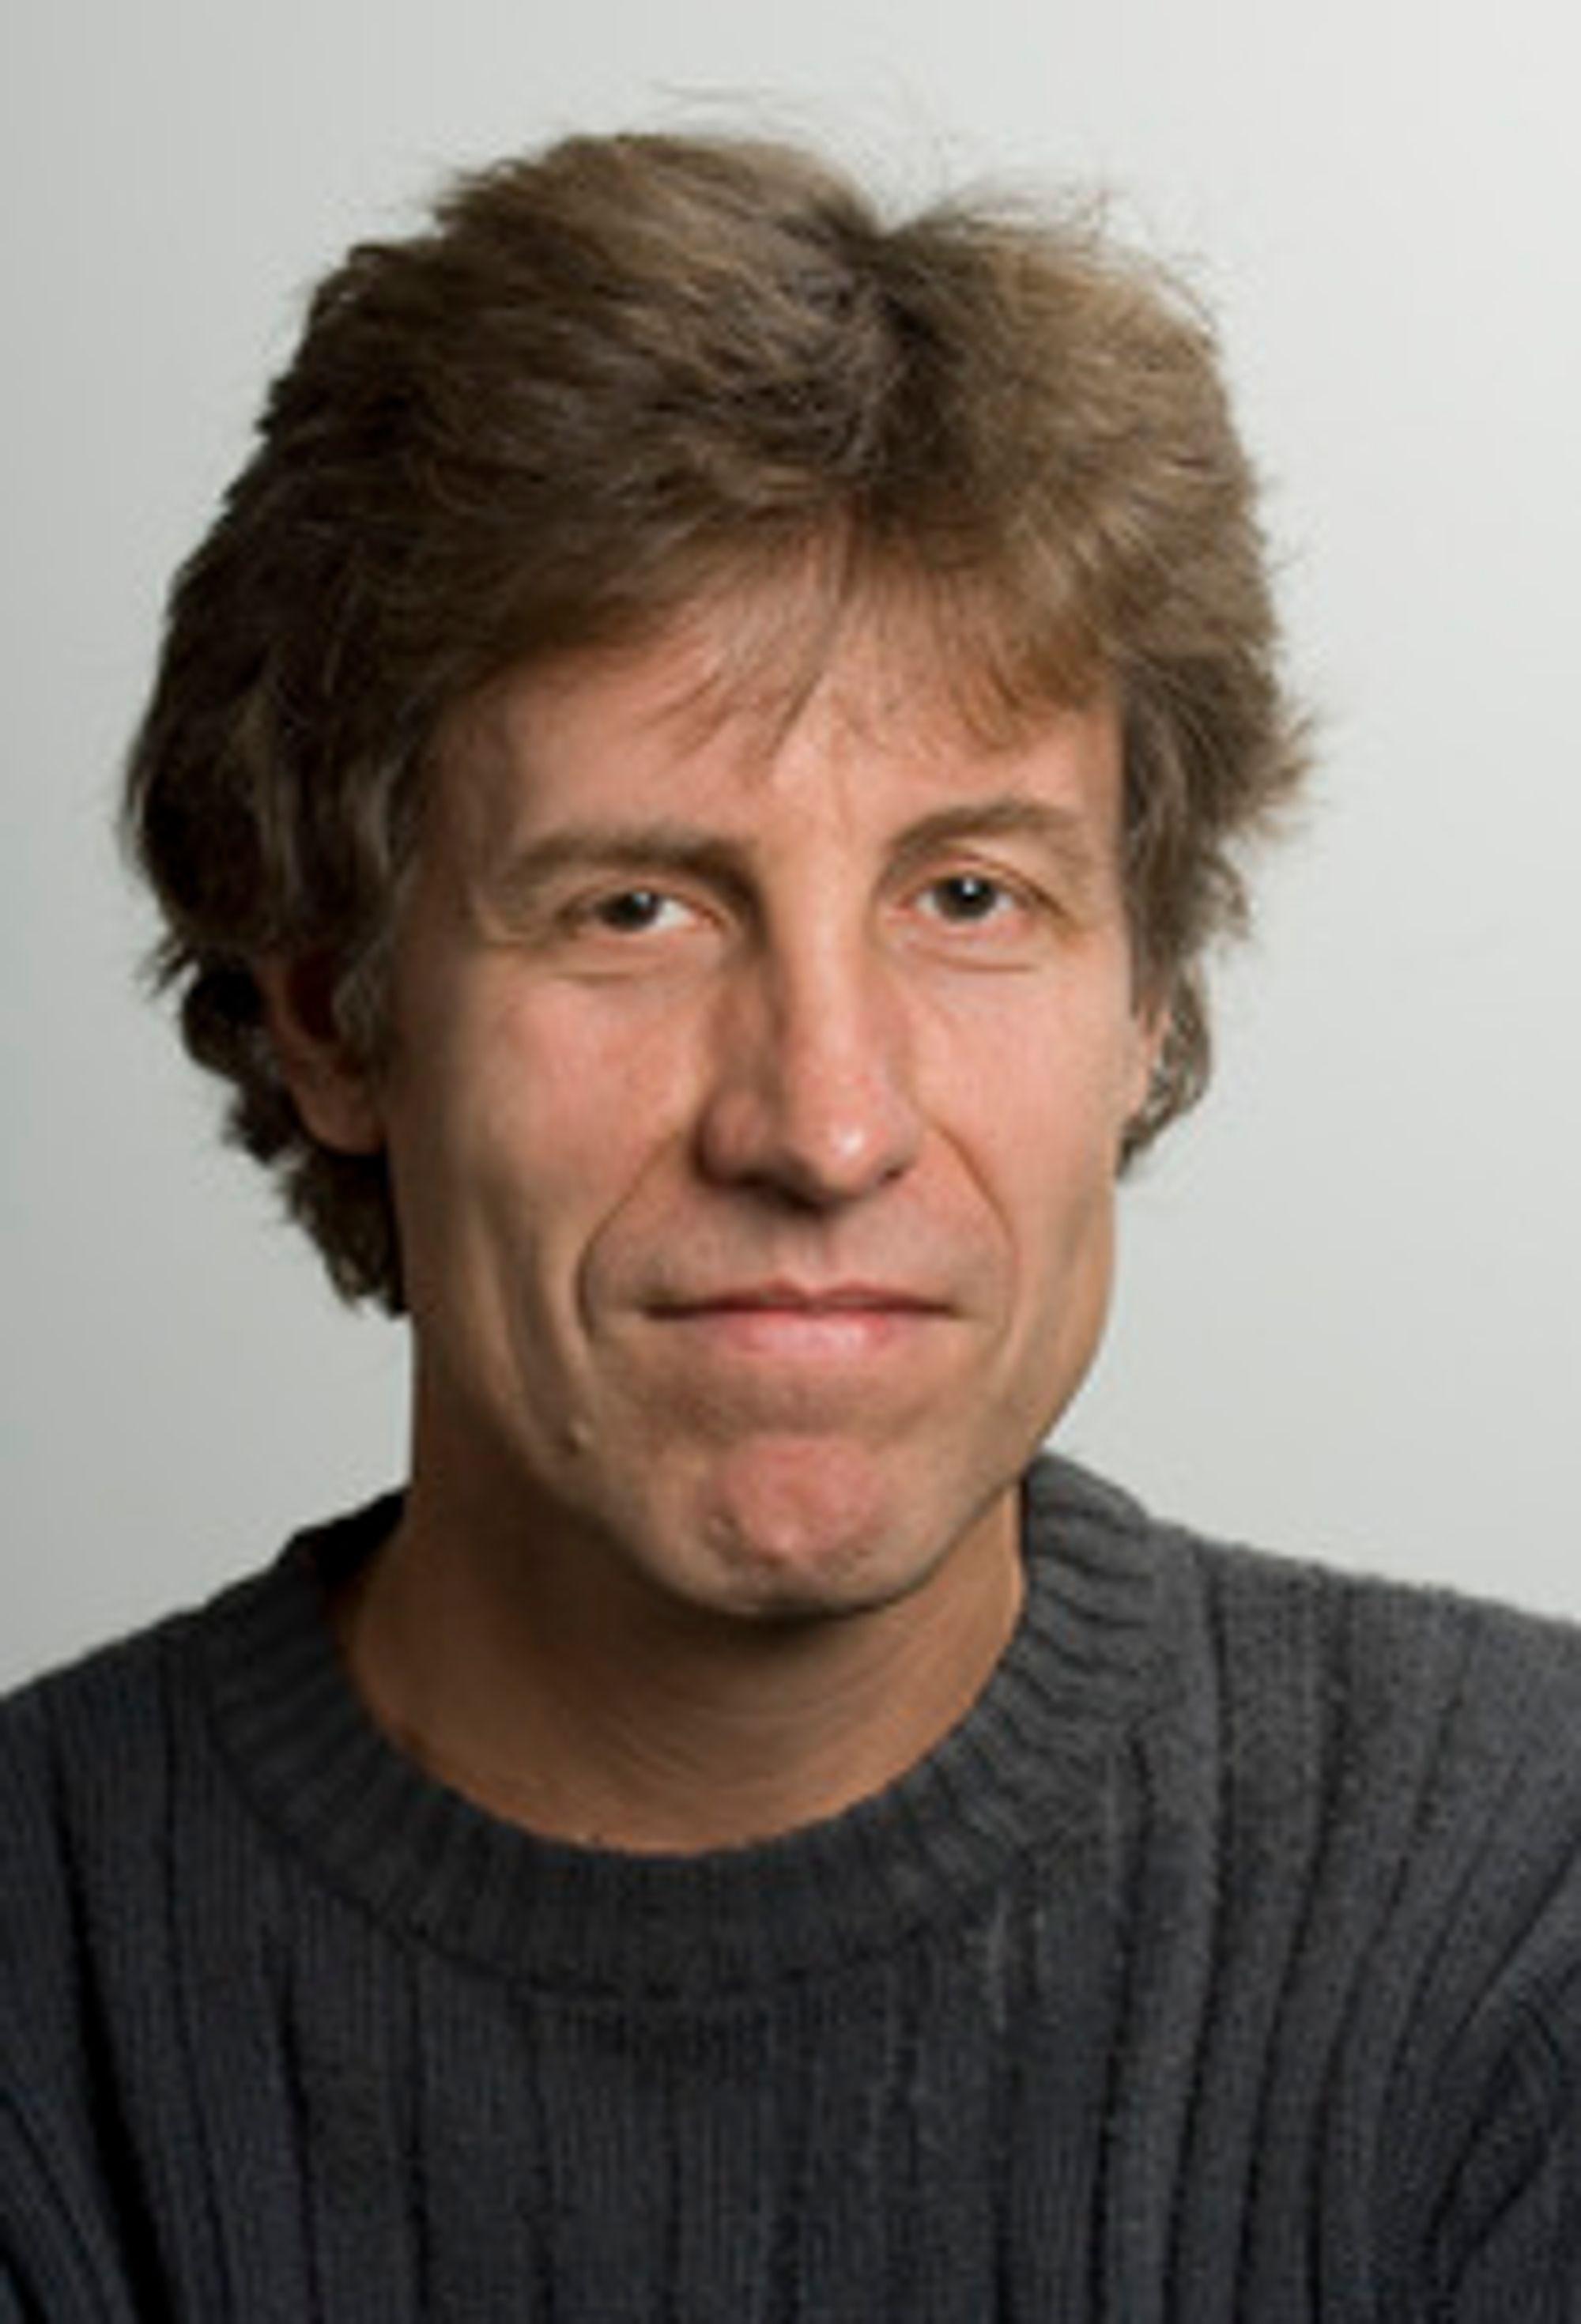 Torkel Bjørnskau, forskningsleder ved avdeling for sikkerhet og miljø ved Transportøkonomisk Institutt.